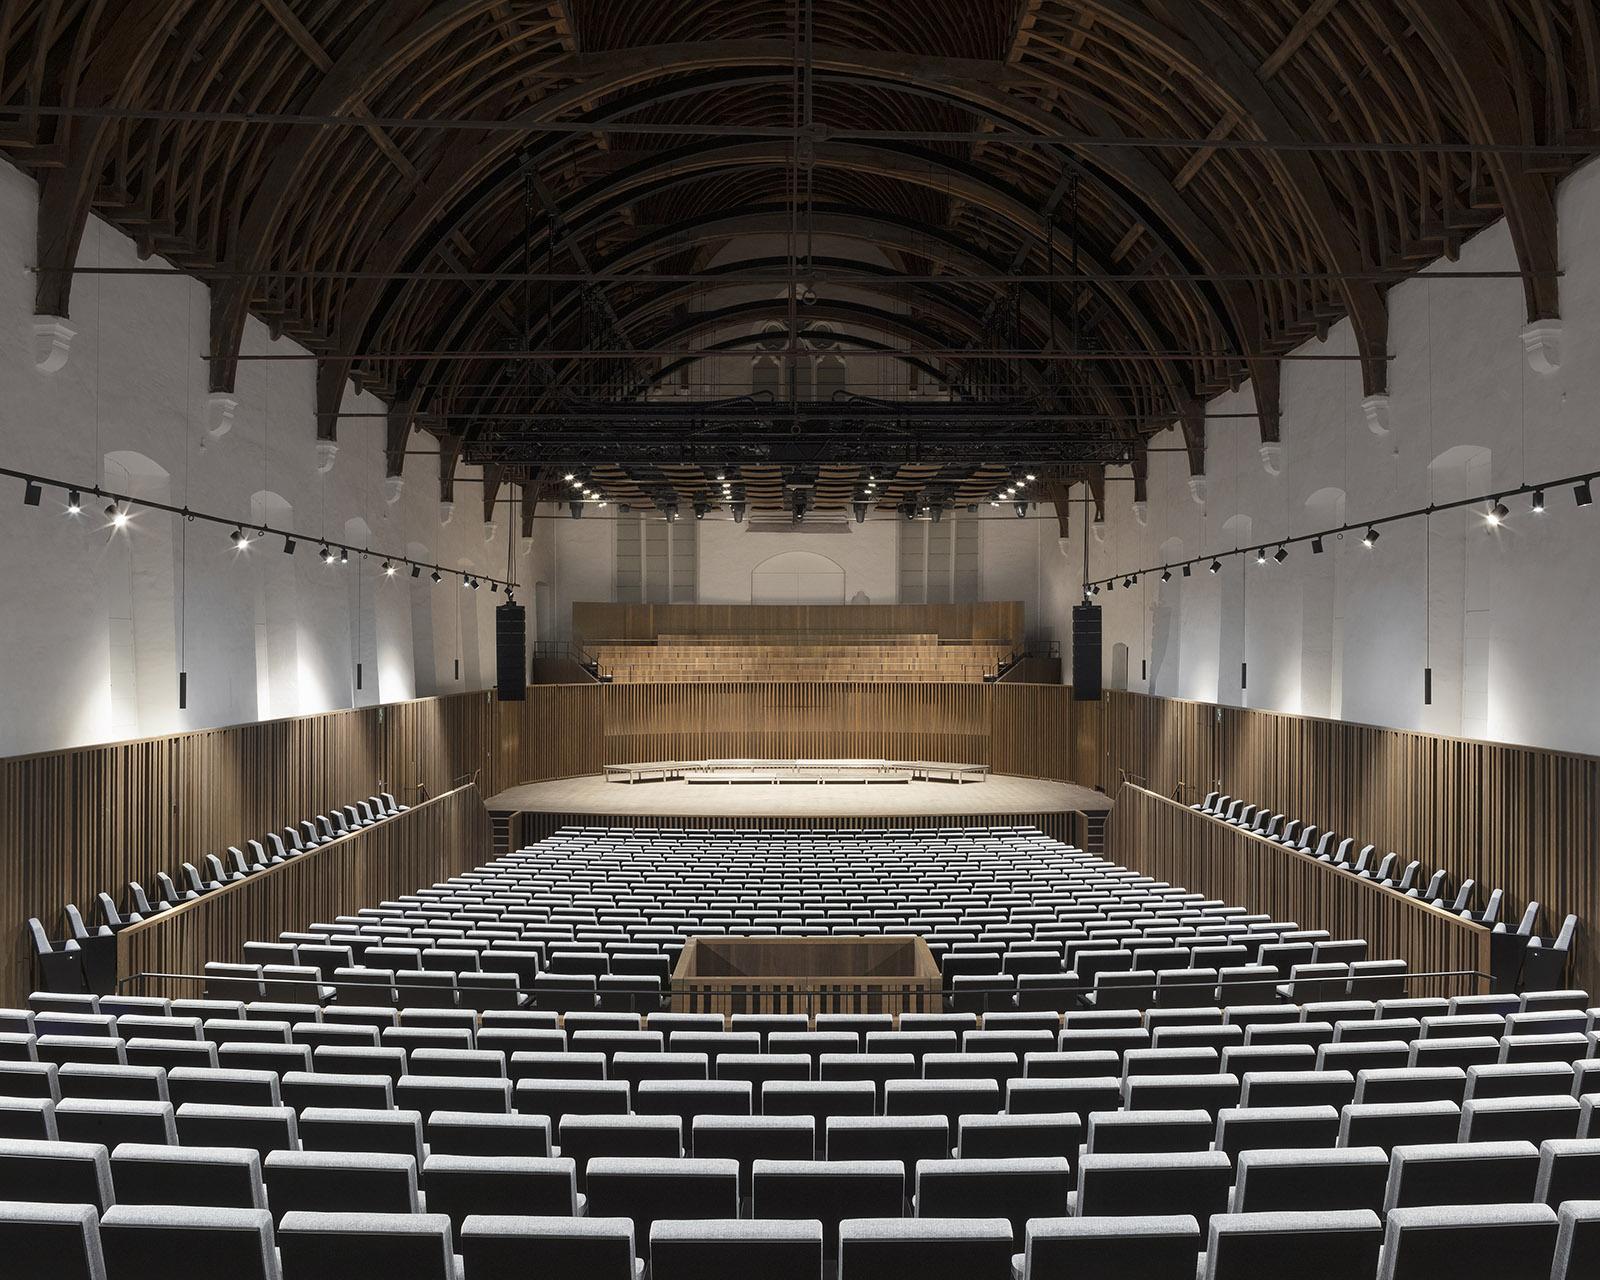 Concert Hall, Muziekcentrum de Bijloke in Ghent, Belgium by DRDH Architects